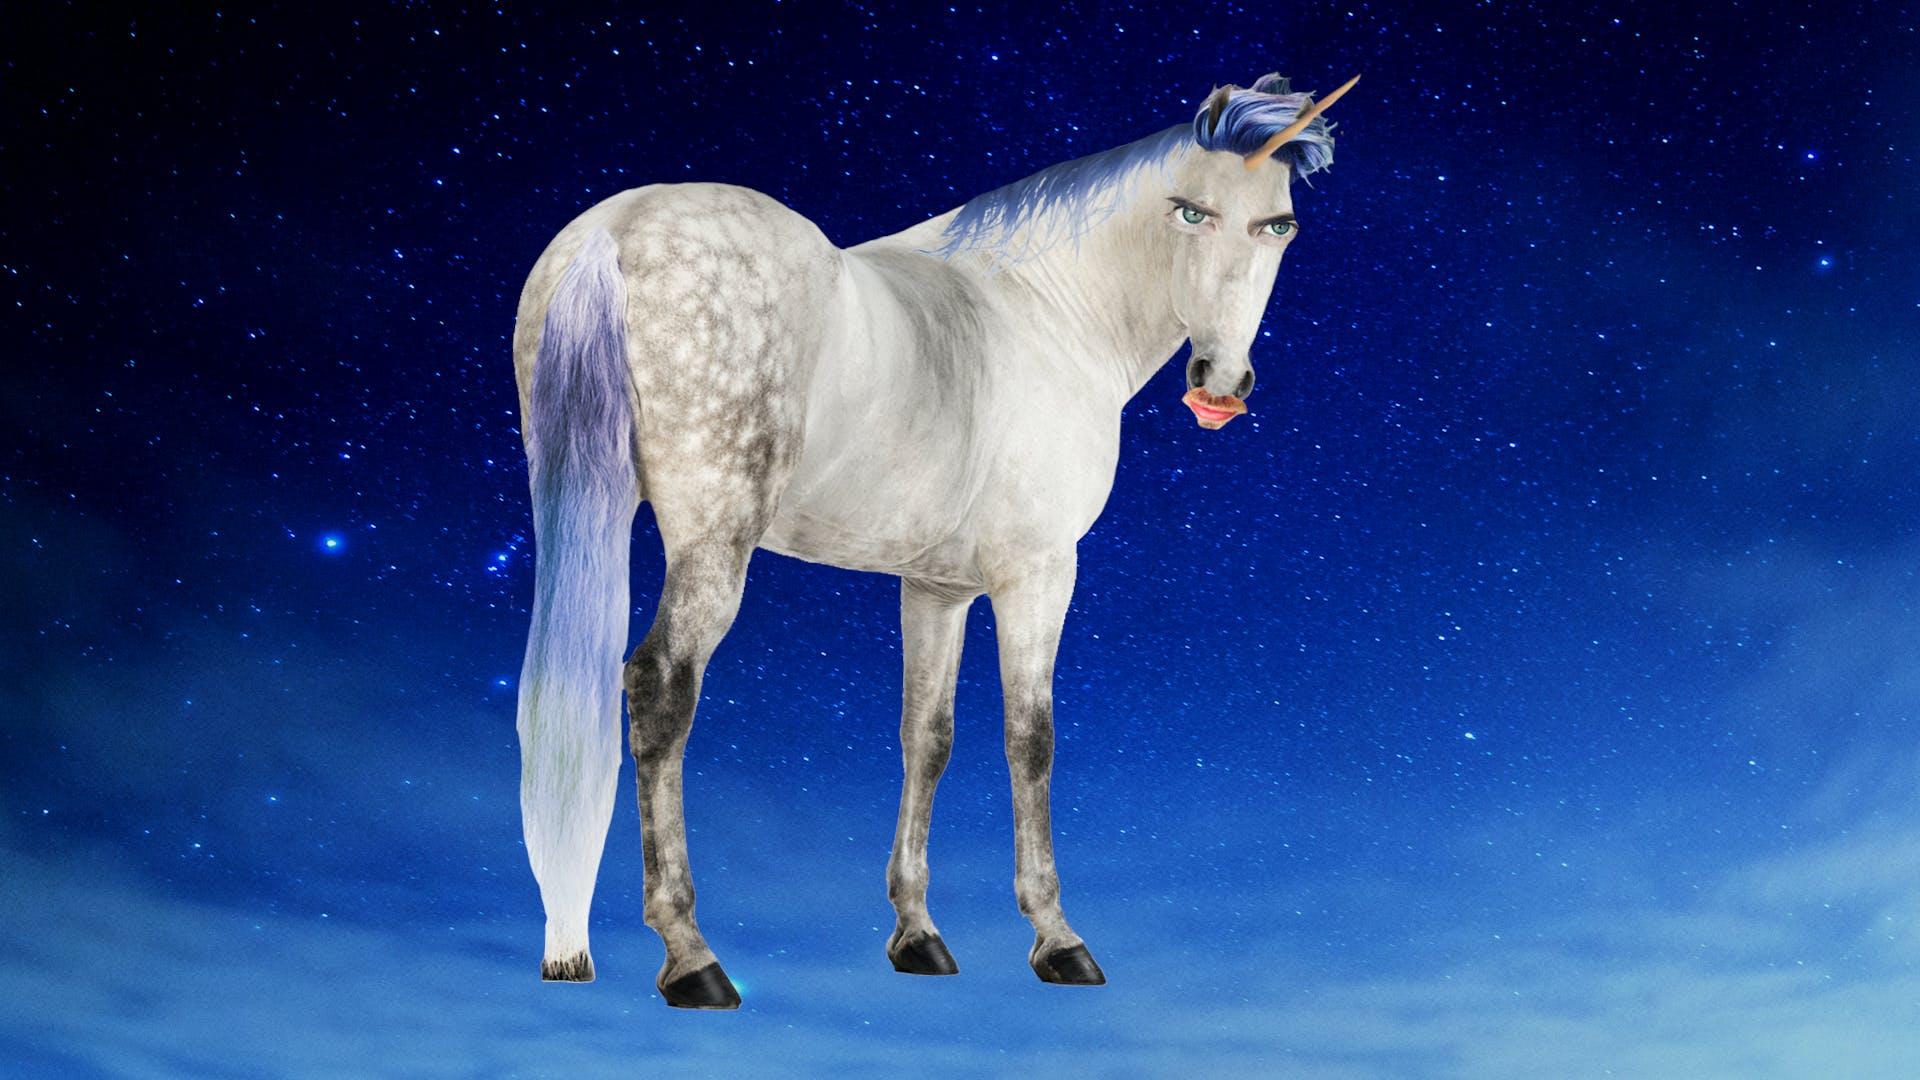 Joey Graceffa as a unicorn